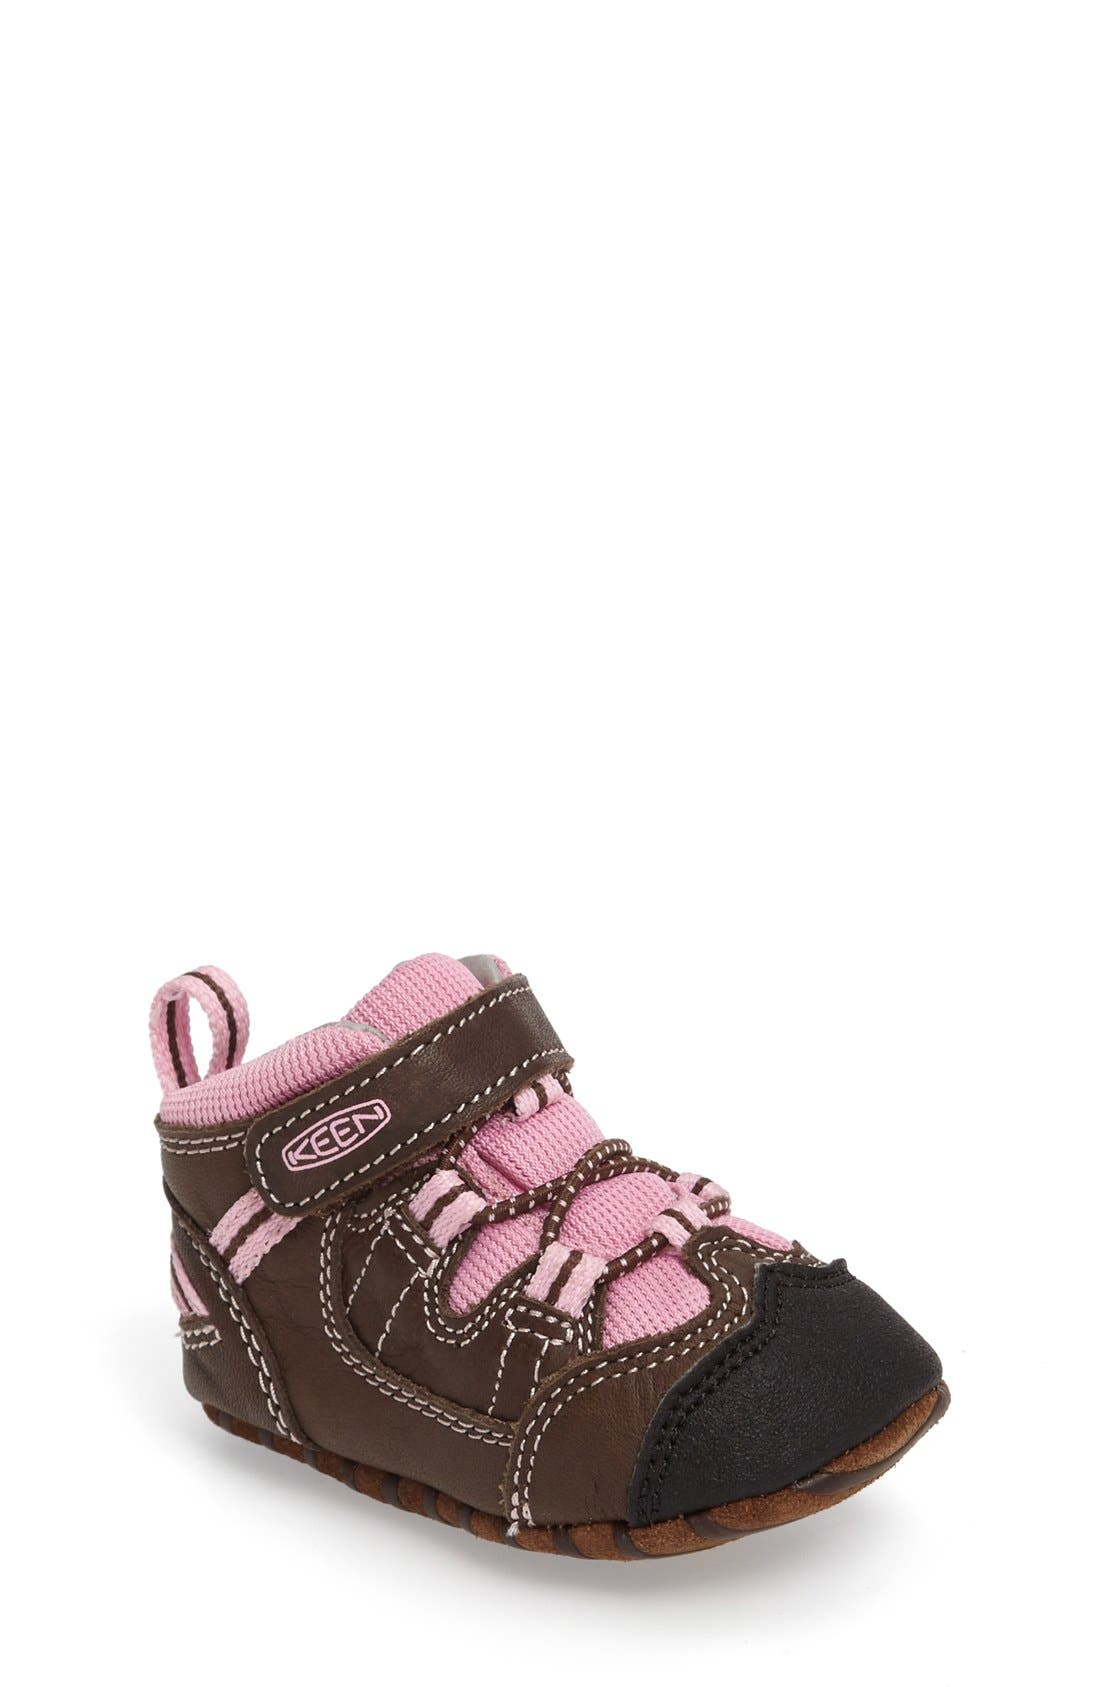 Targhee Crib Shoe,                         Main,                         color, 204